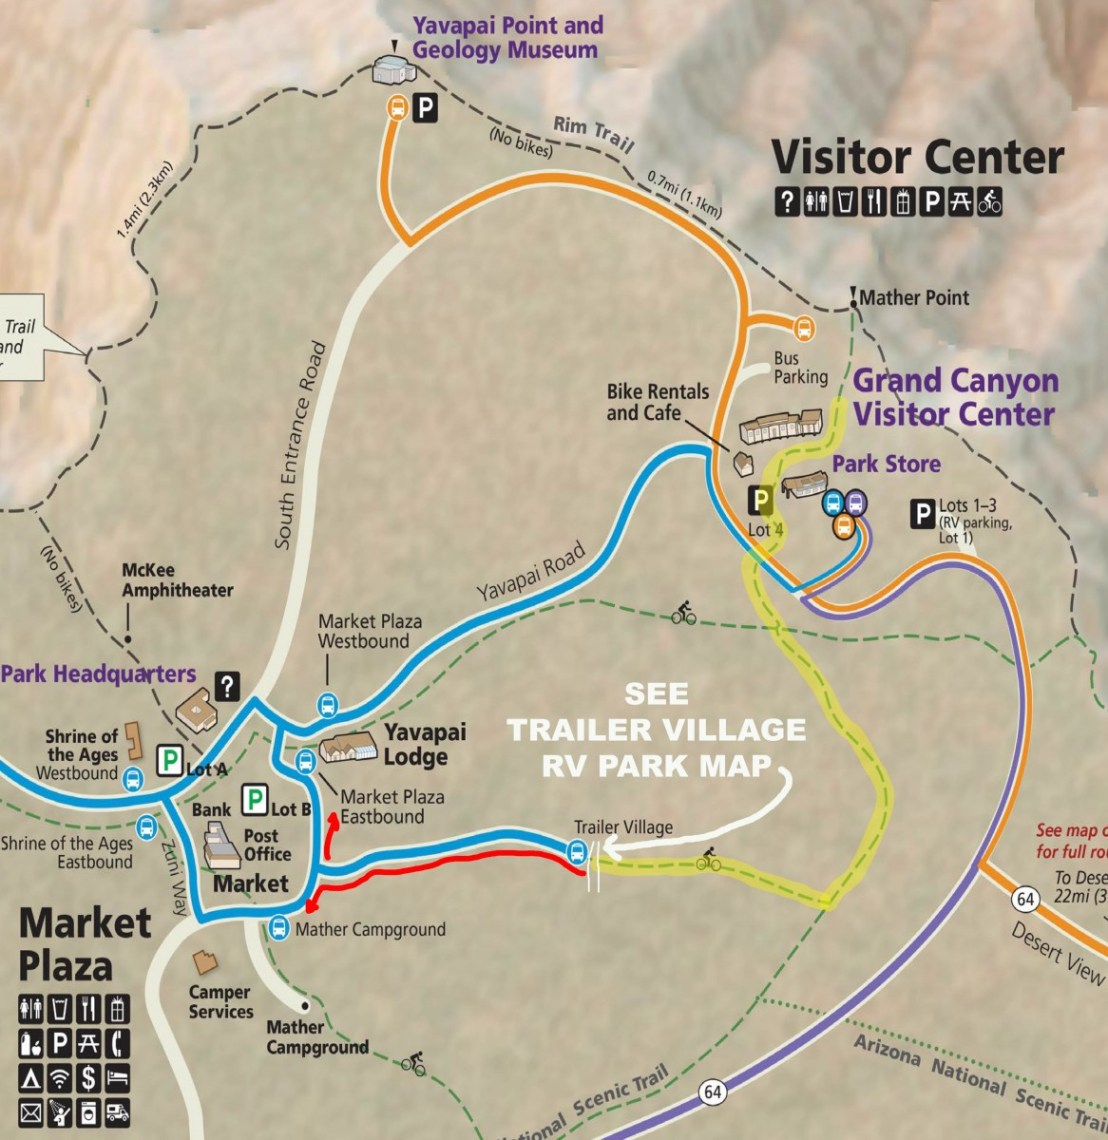 National Park Service Map of Trailer Village RV Park Area